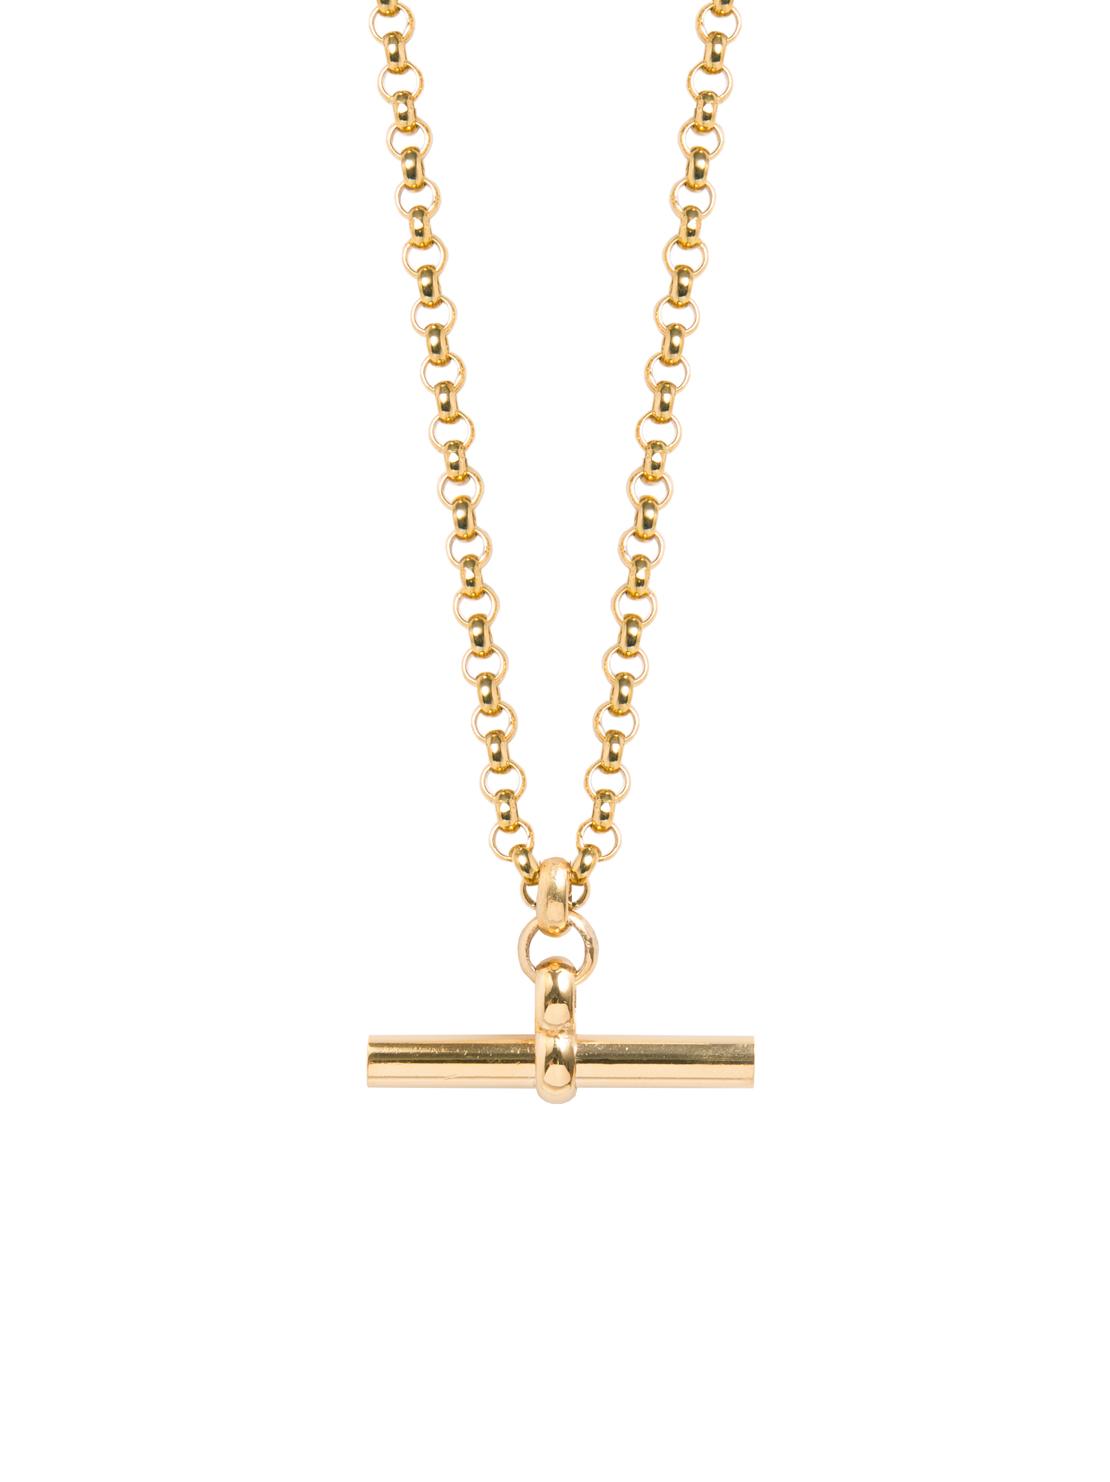 66453b86f95361 Medium Gold T-Bar On Chunky Gold Belcher Chain - Tilly Sveaas Jewellery